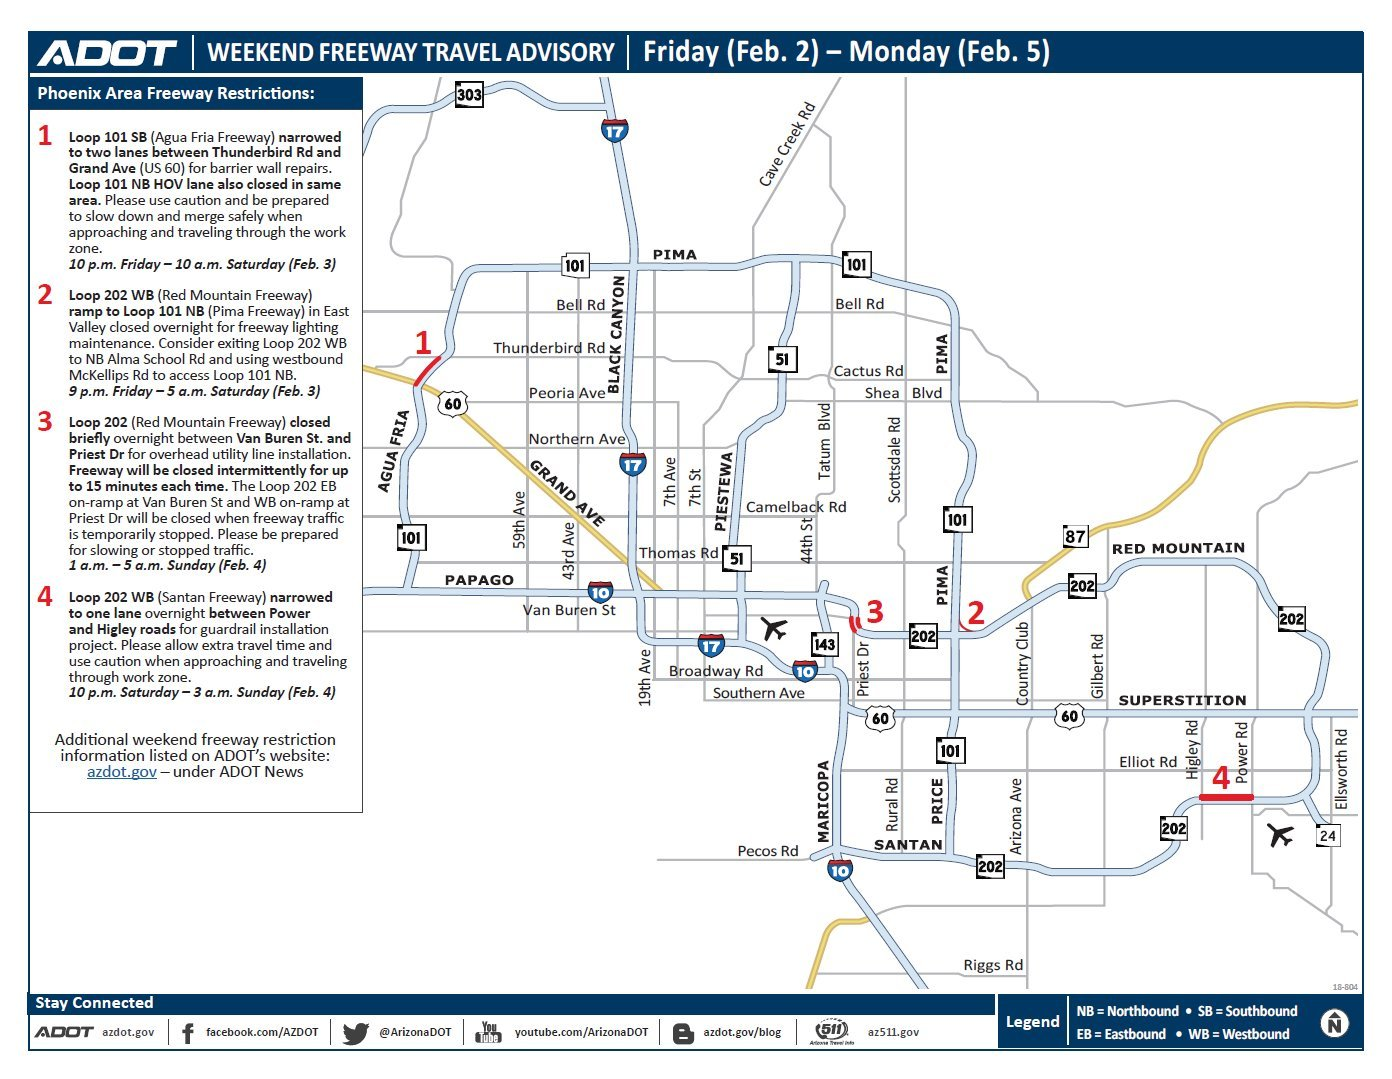 adot s weekend freeway travel advisory feb 2 5 arizona 39 s family. Black Bedroom Furniture Sets. Home Design Ideas